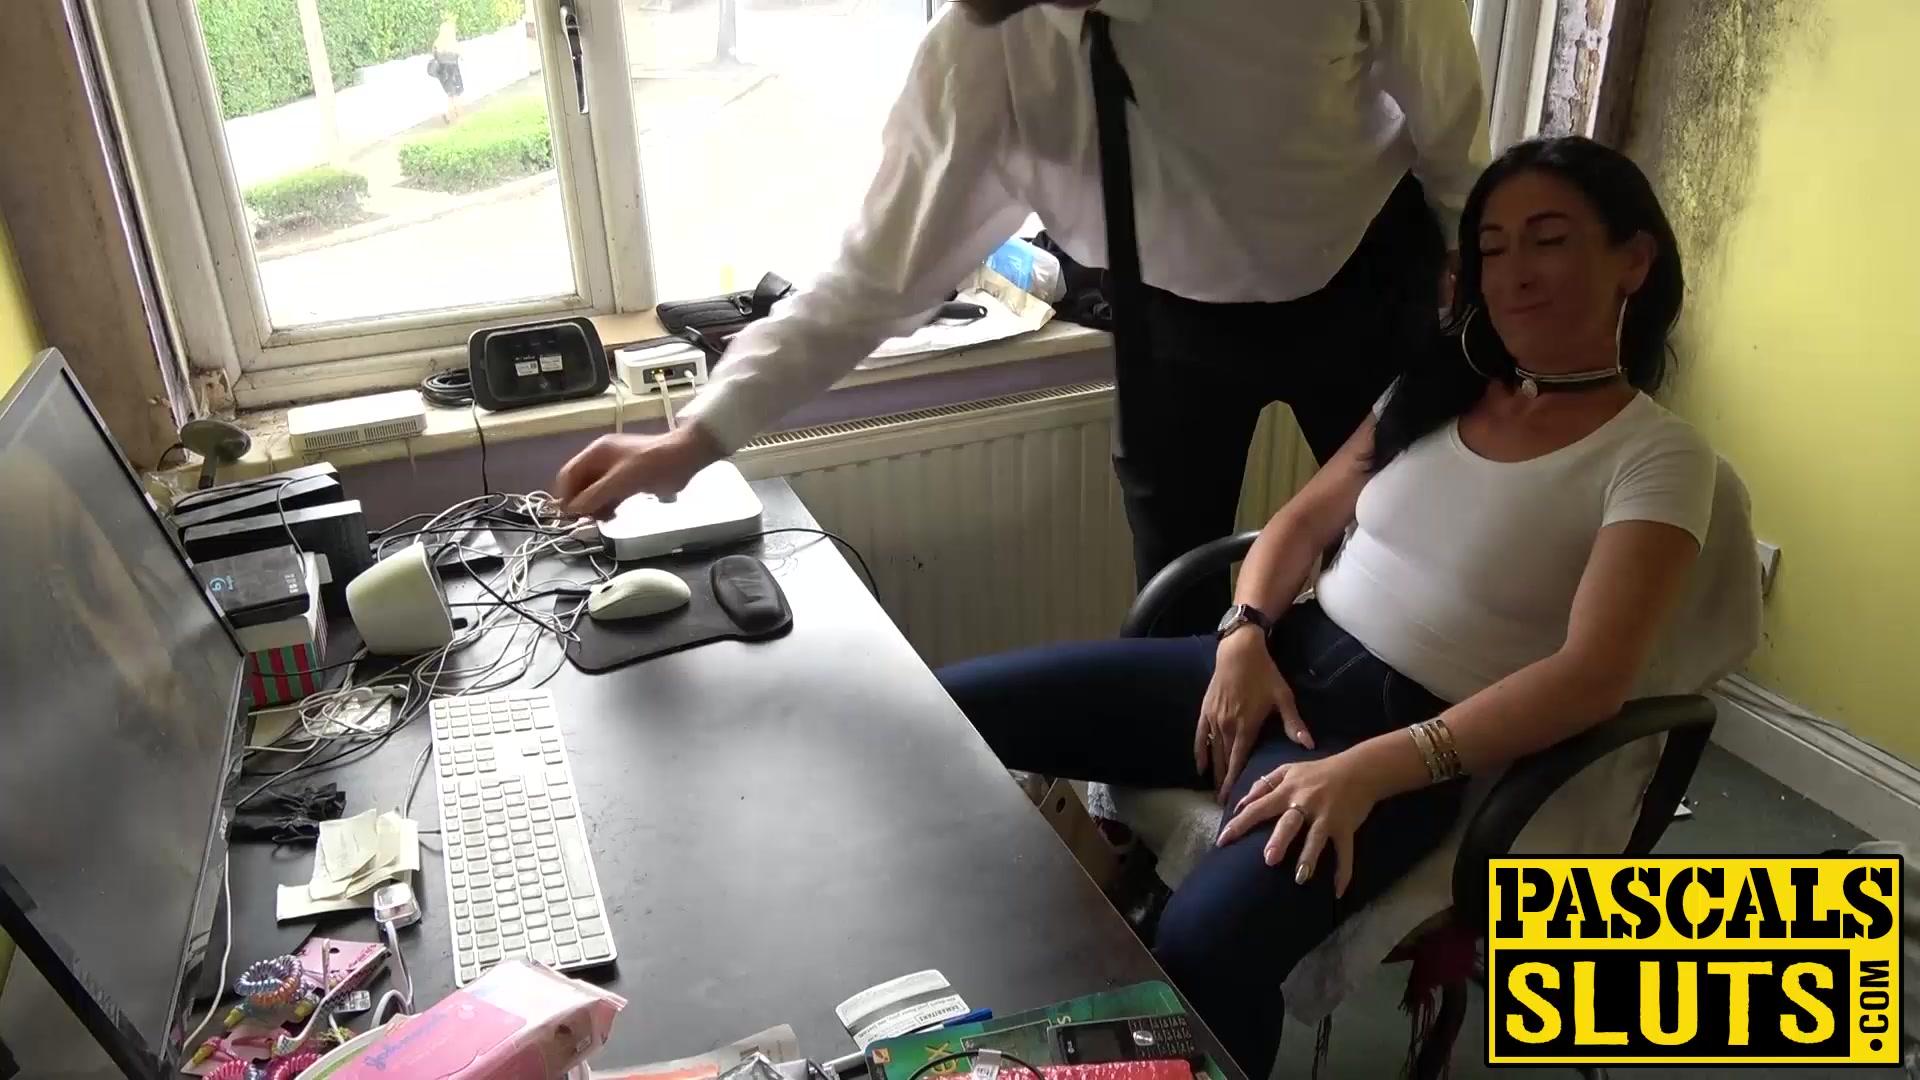 Porn galleries Bverfgg kommentar online dating